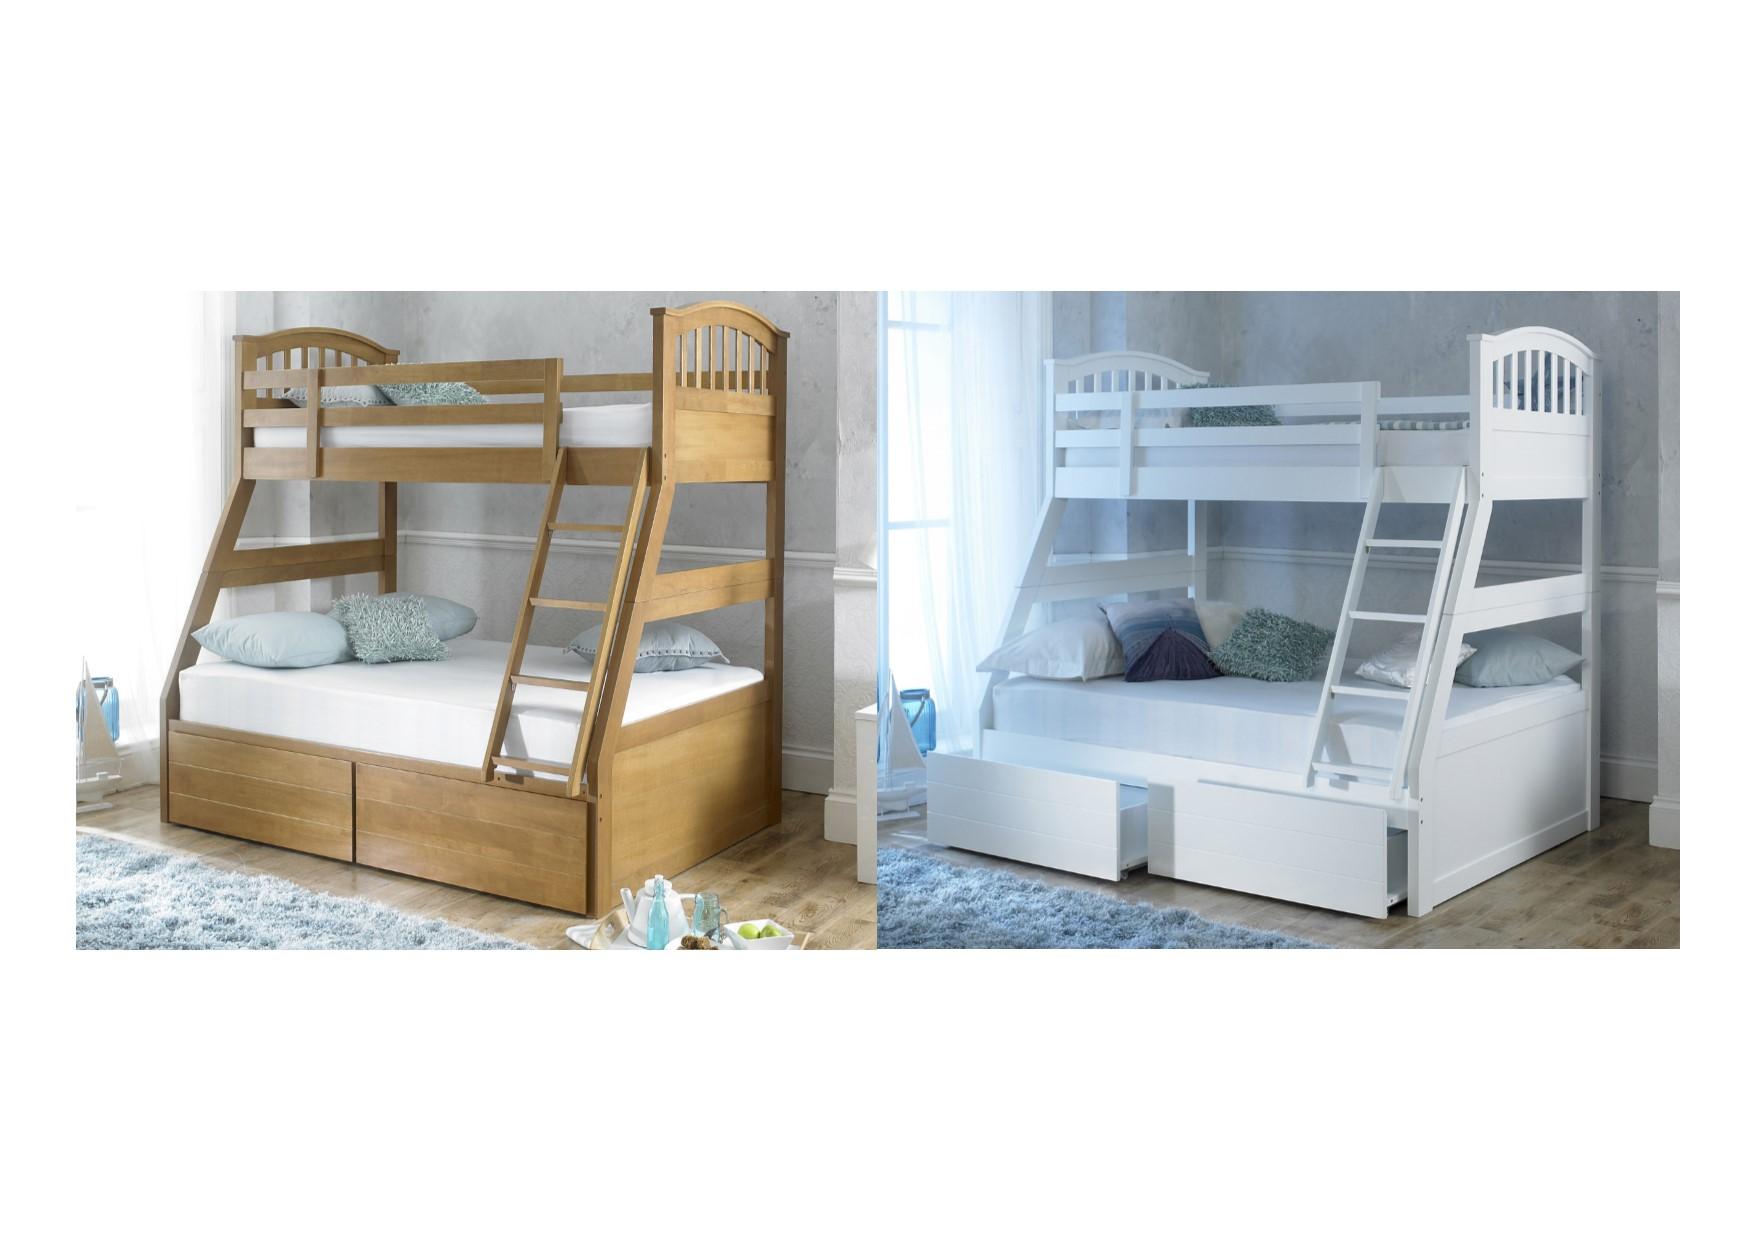 artisan beds barbican three sleeper or bunk bed oak or white ebay. Black Bedroom Furniture Sets. Home Design Ideas